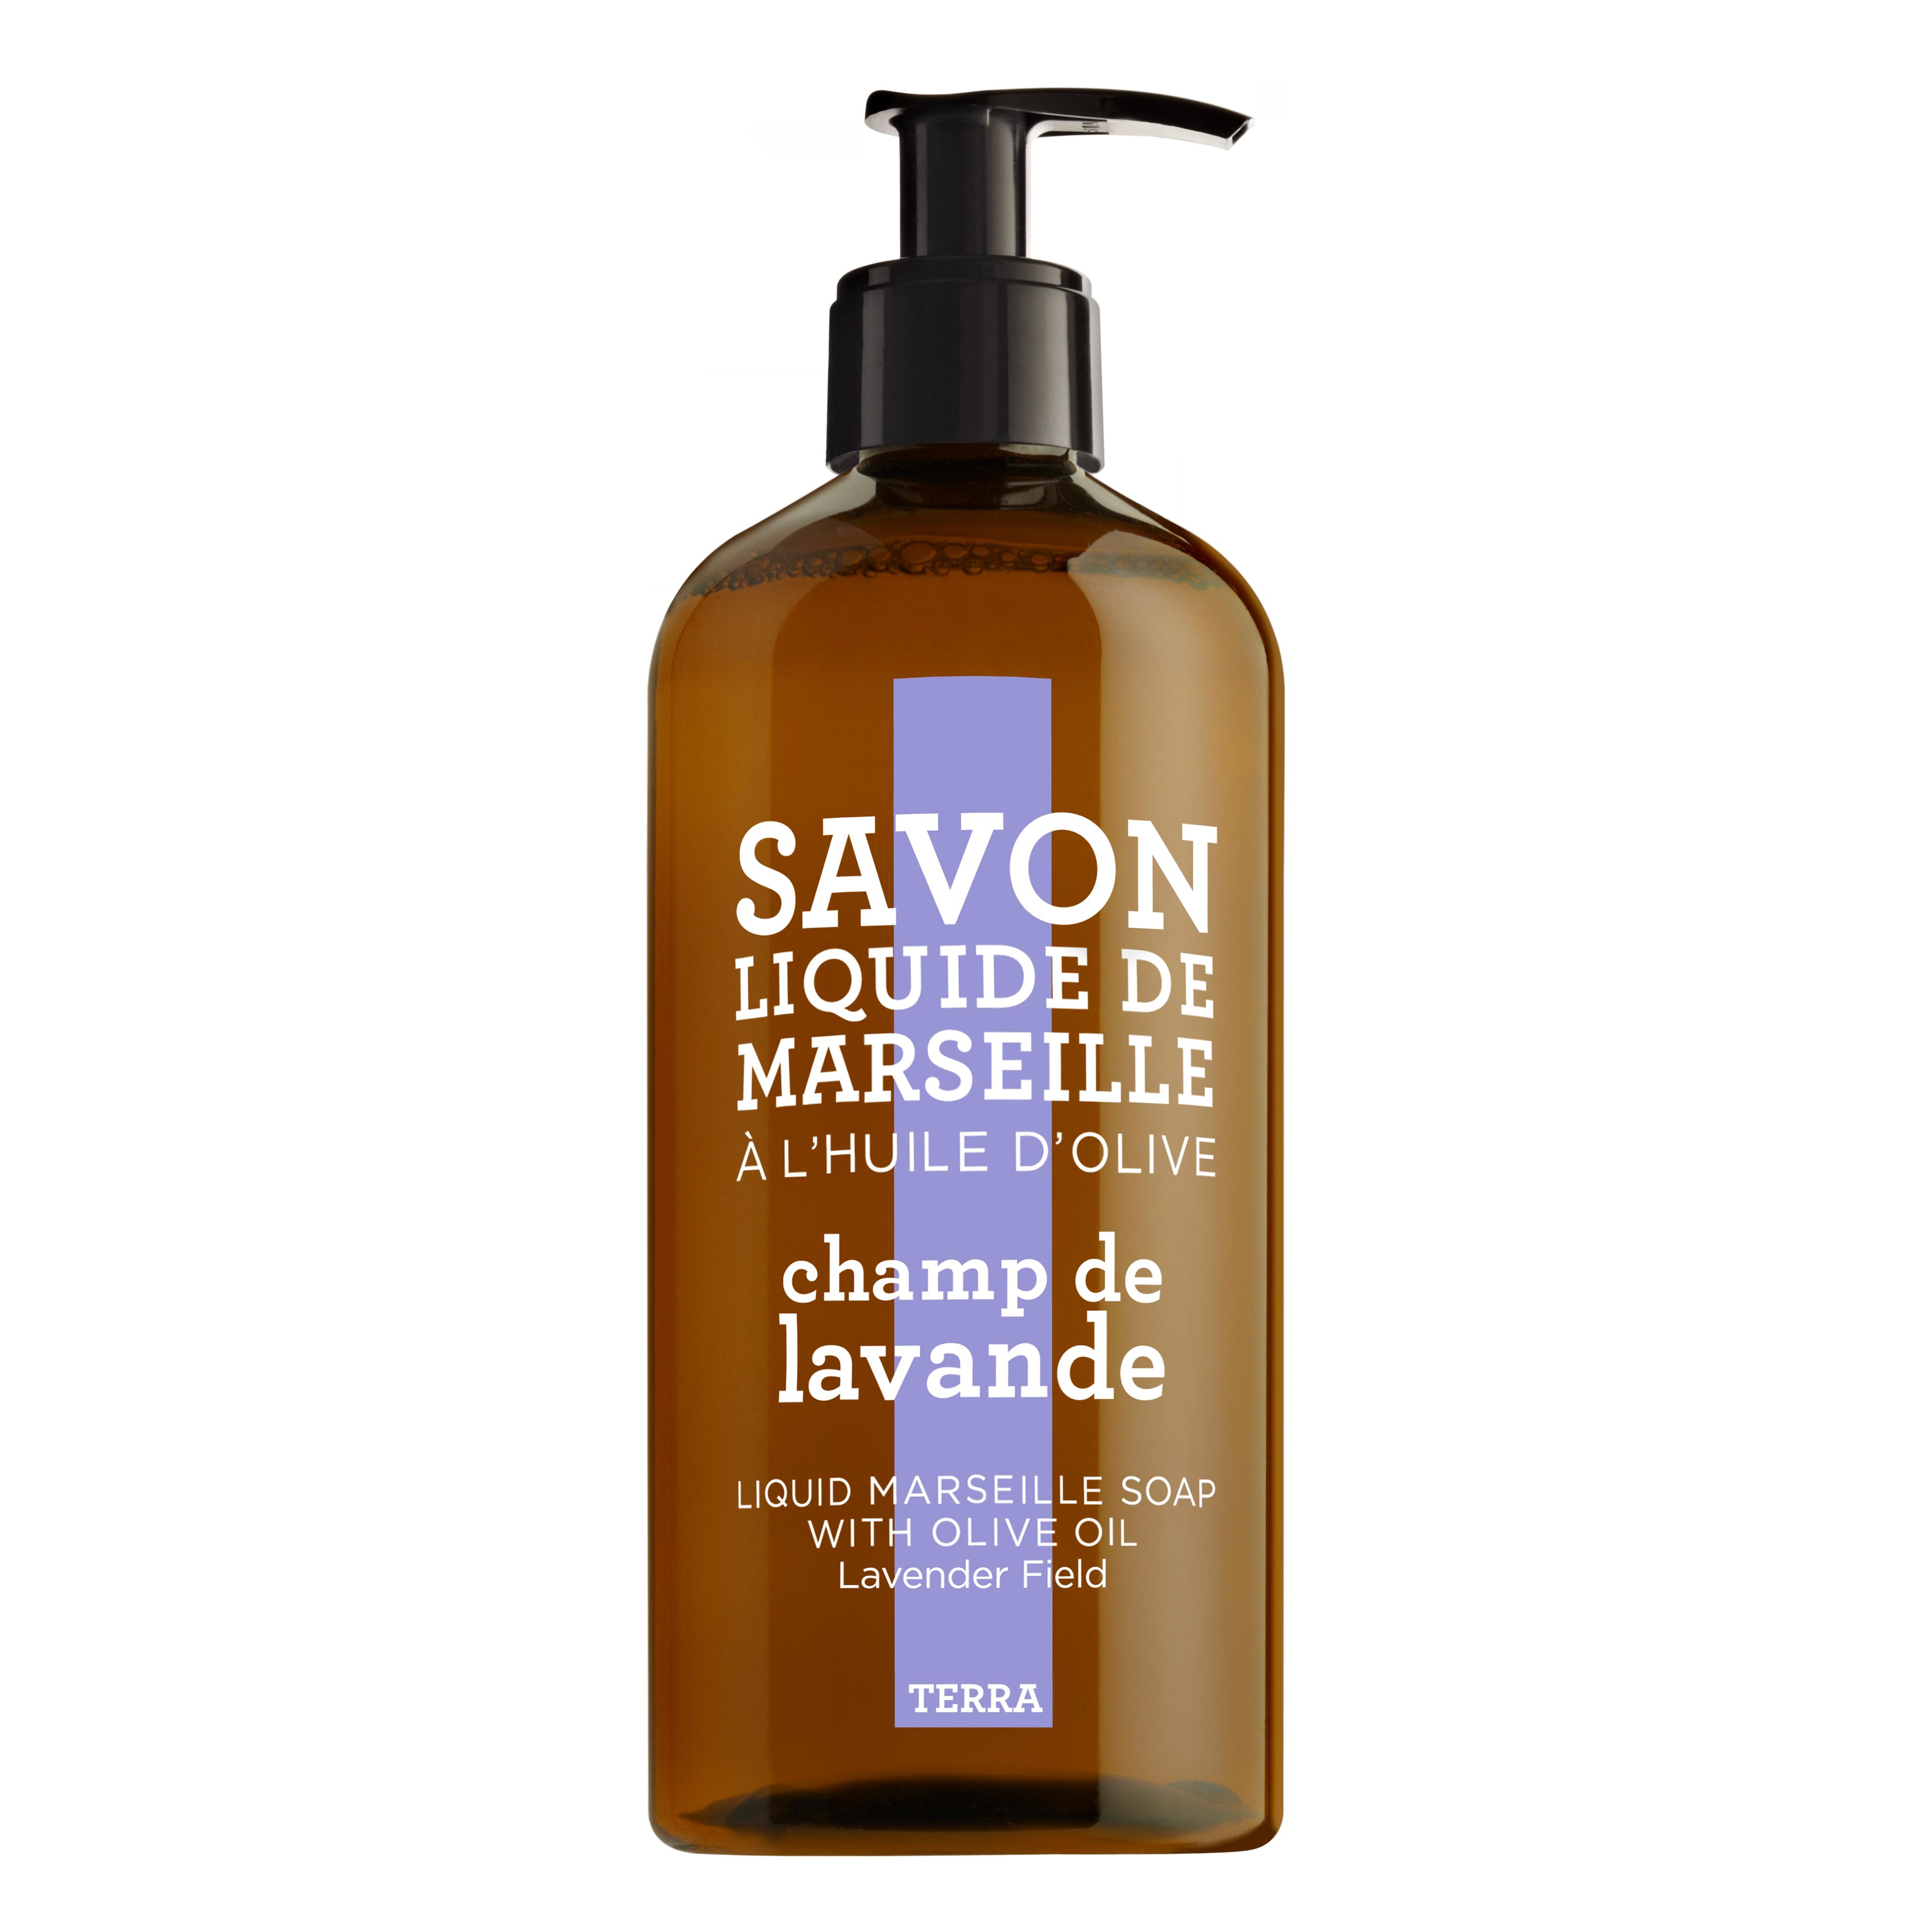 Lavender Field Liquid Soap